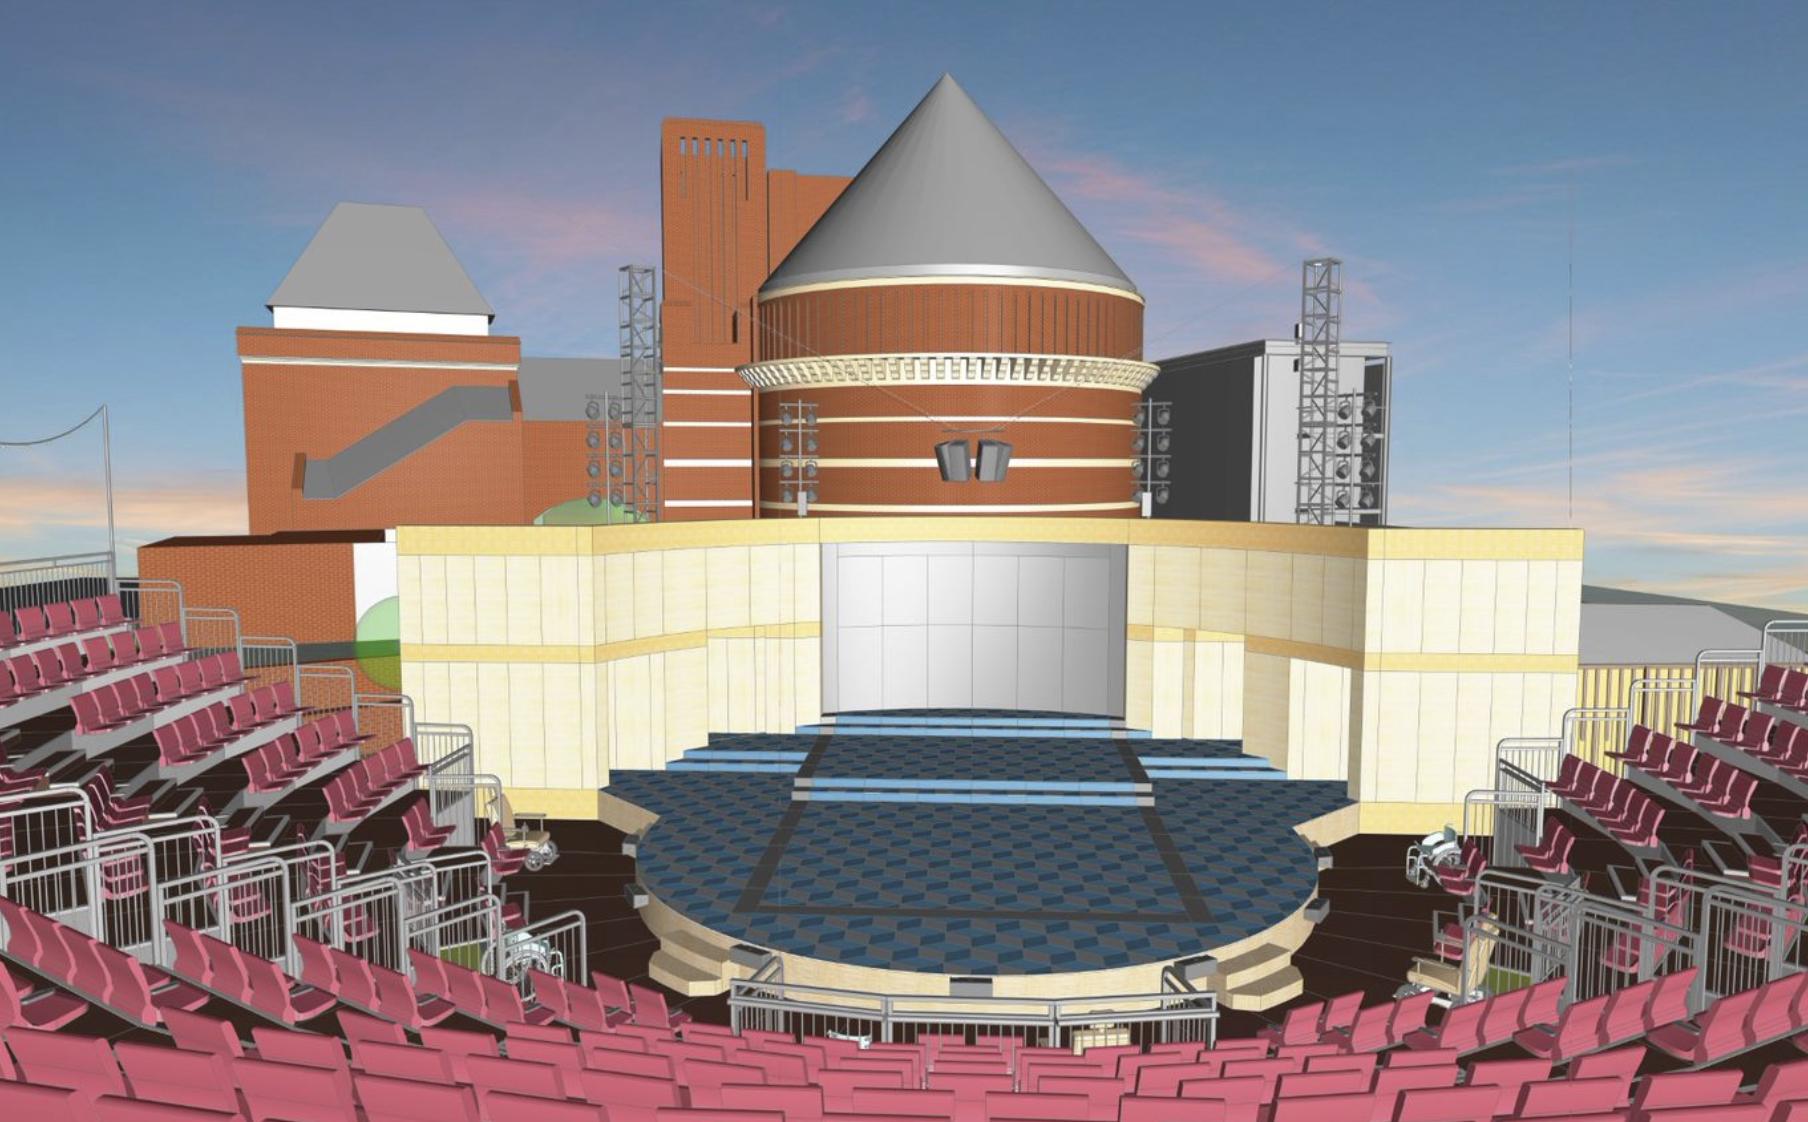 The Lydia & Manfred Gorvy Garden Theatre.  https://www.rsc.org.uk/your-visit/our-theatres/garden-theatre